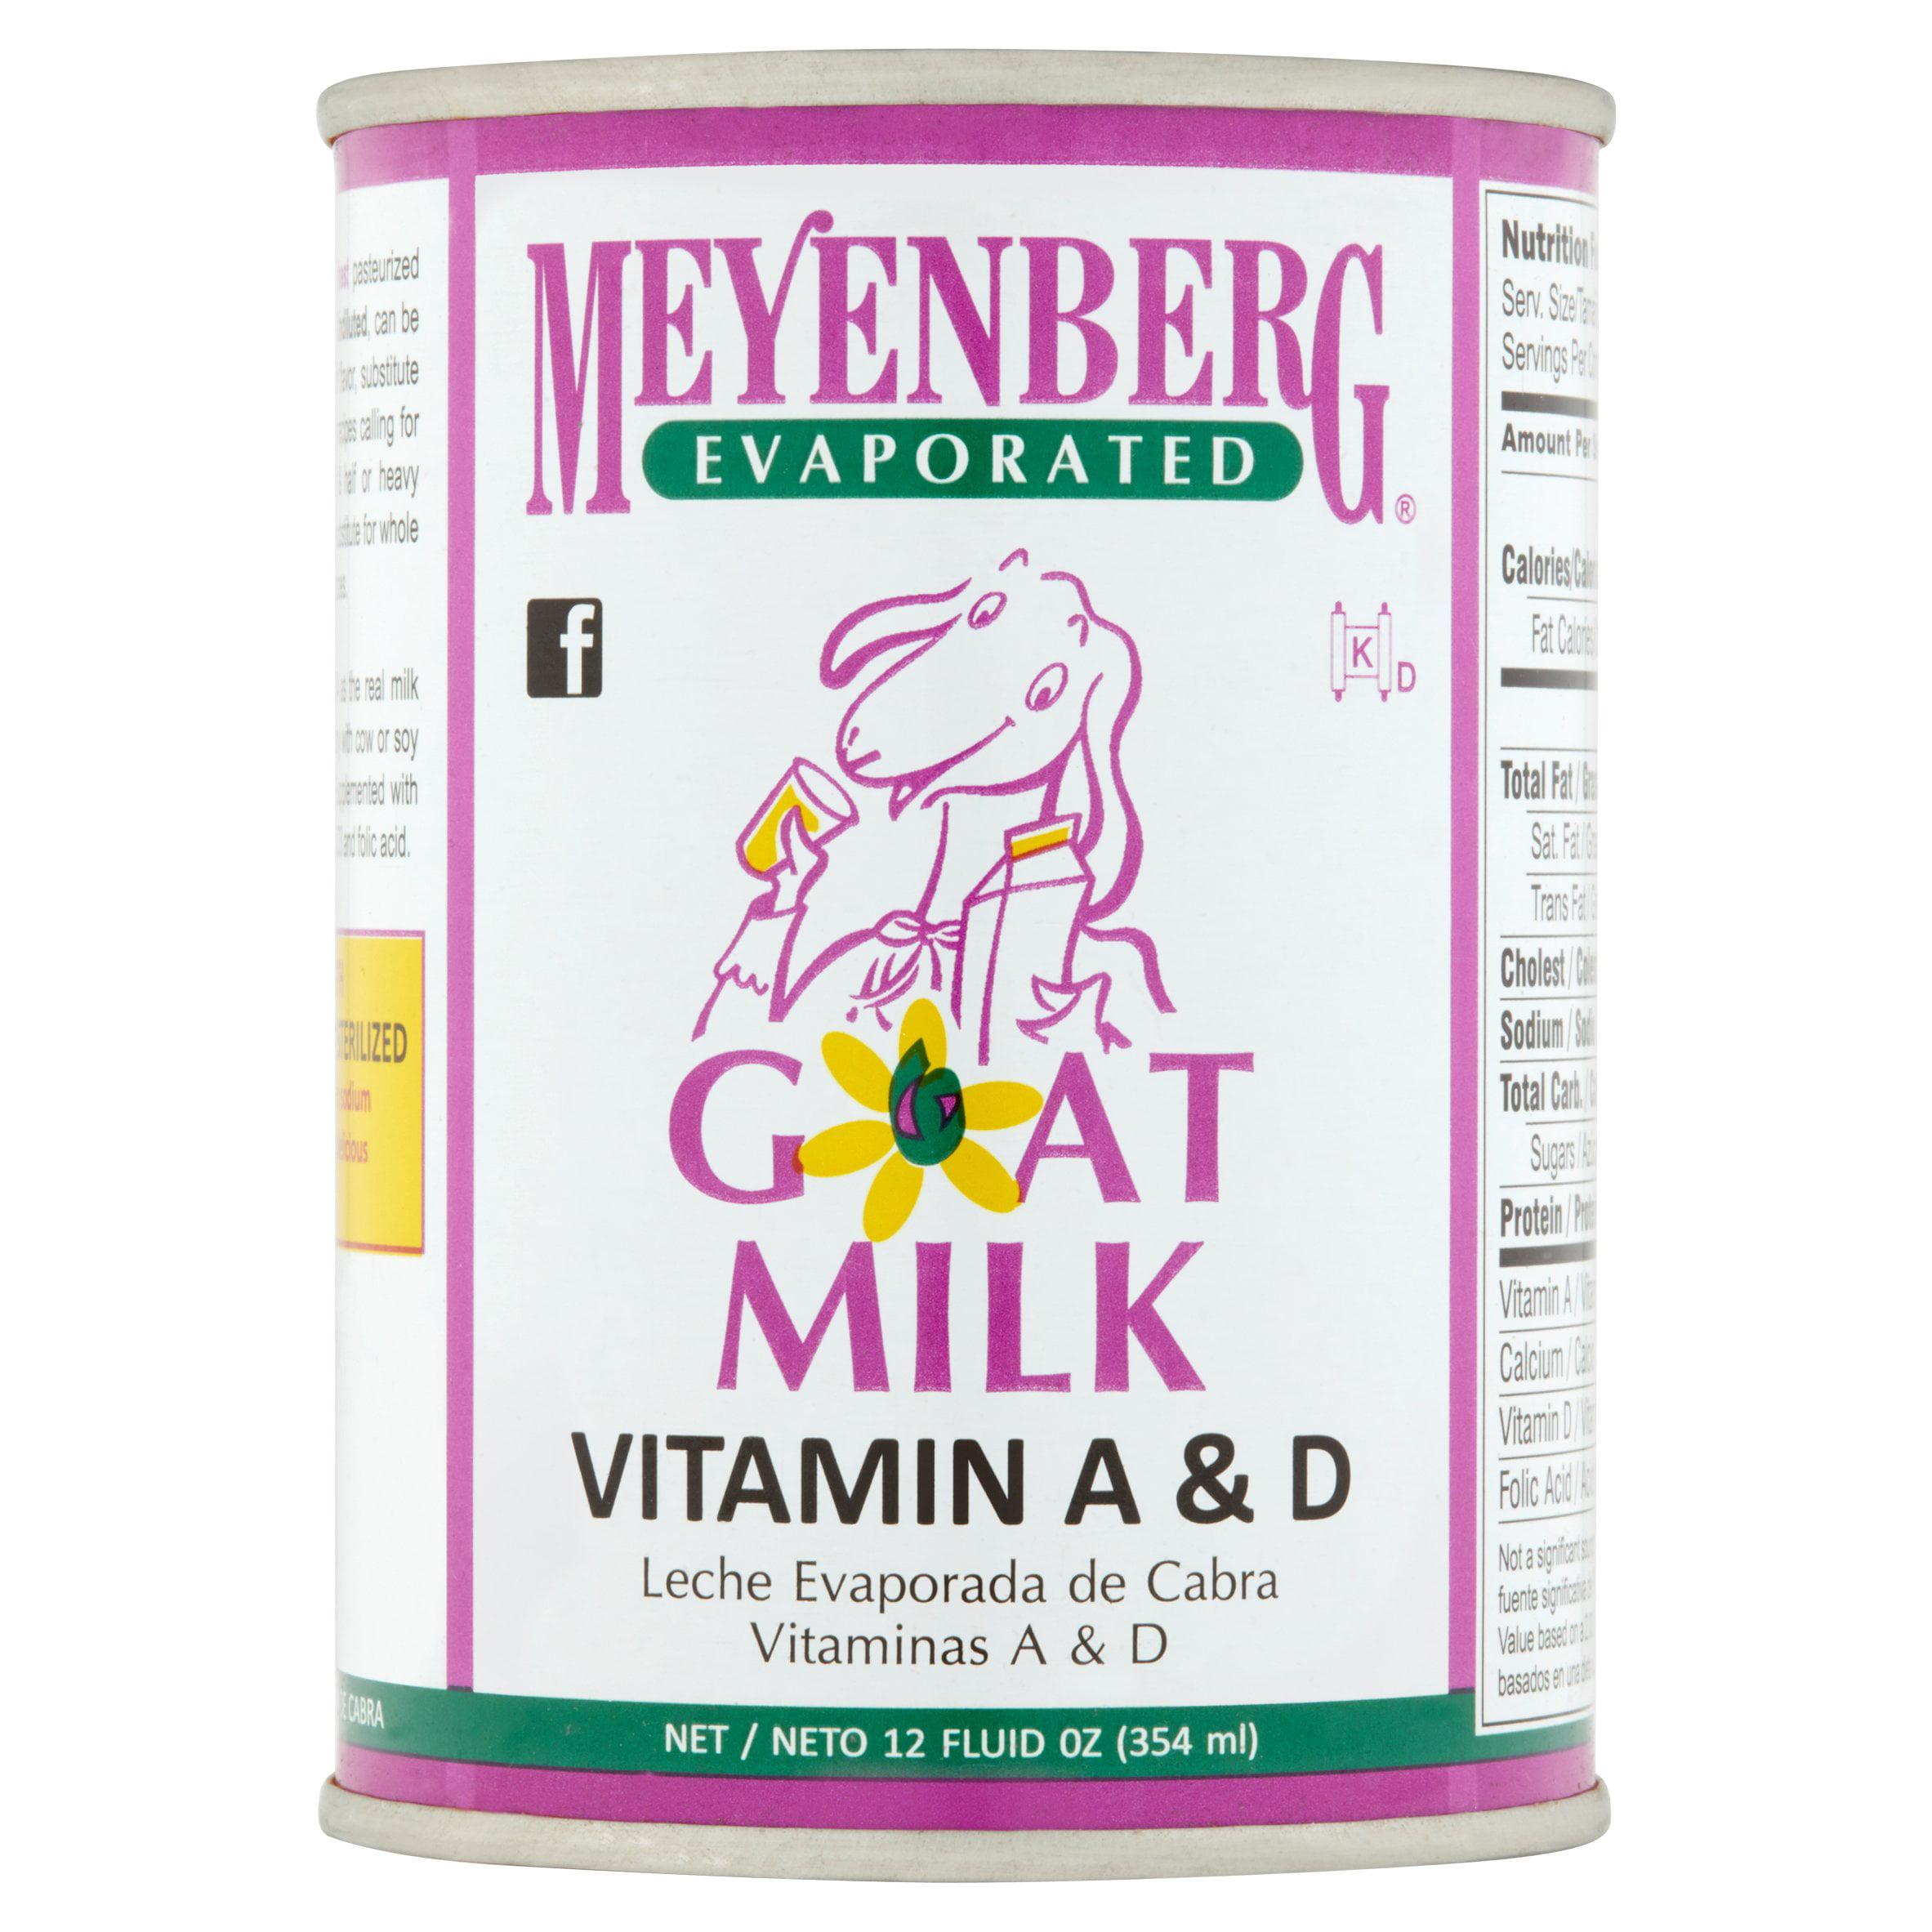 Meyenberg Evaporated Vitamin D Goat Milk, 12 fl oz by Jackson-Mitchell, Inc.